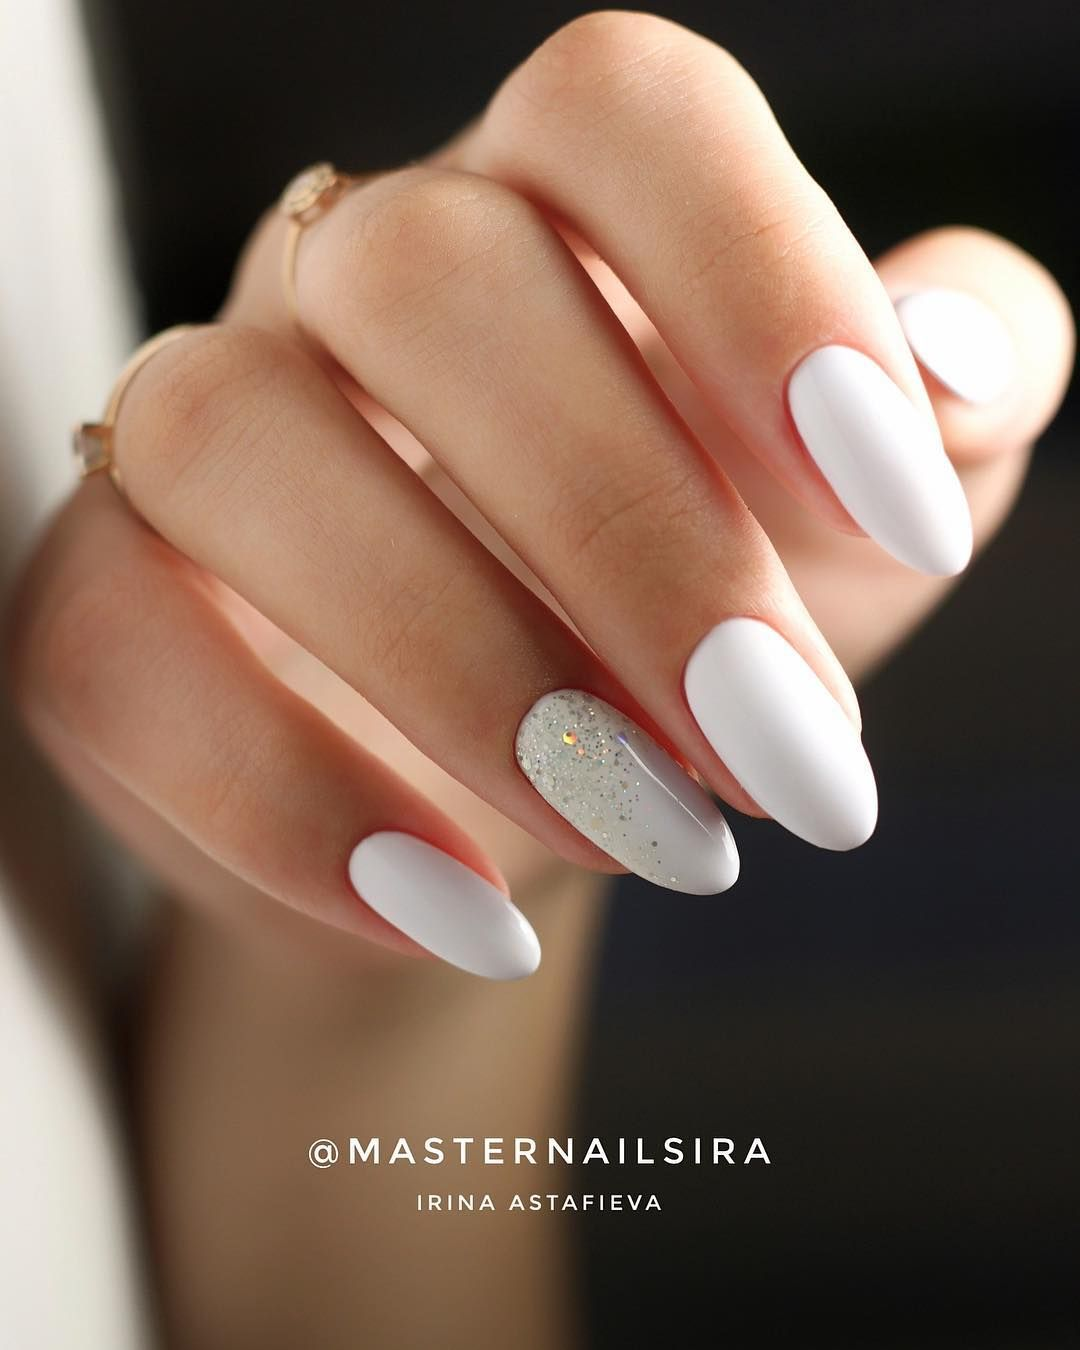 48 Stylish Acrylic White Nail Art Designs And Ideas In 2020 Gelove Nehty Dlouhe Nehty Nehty